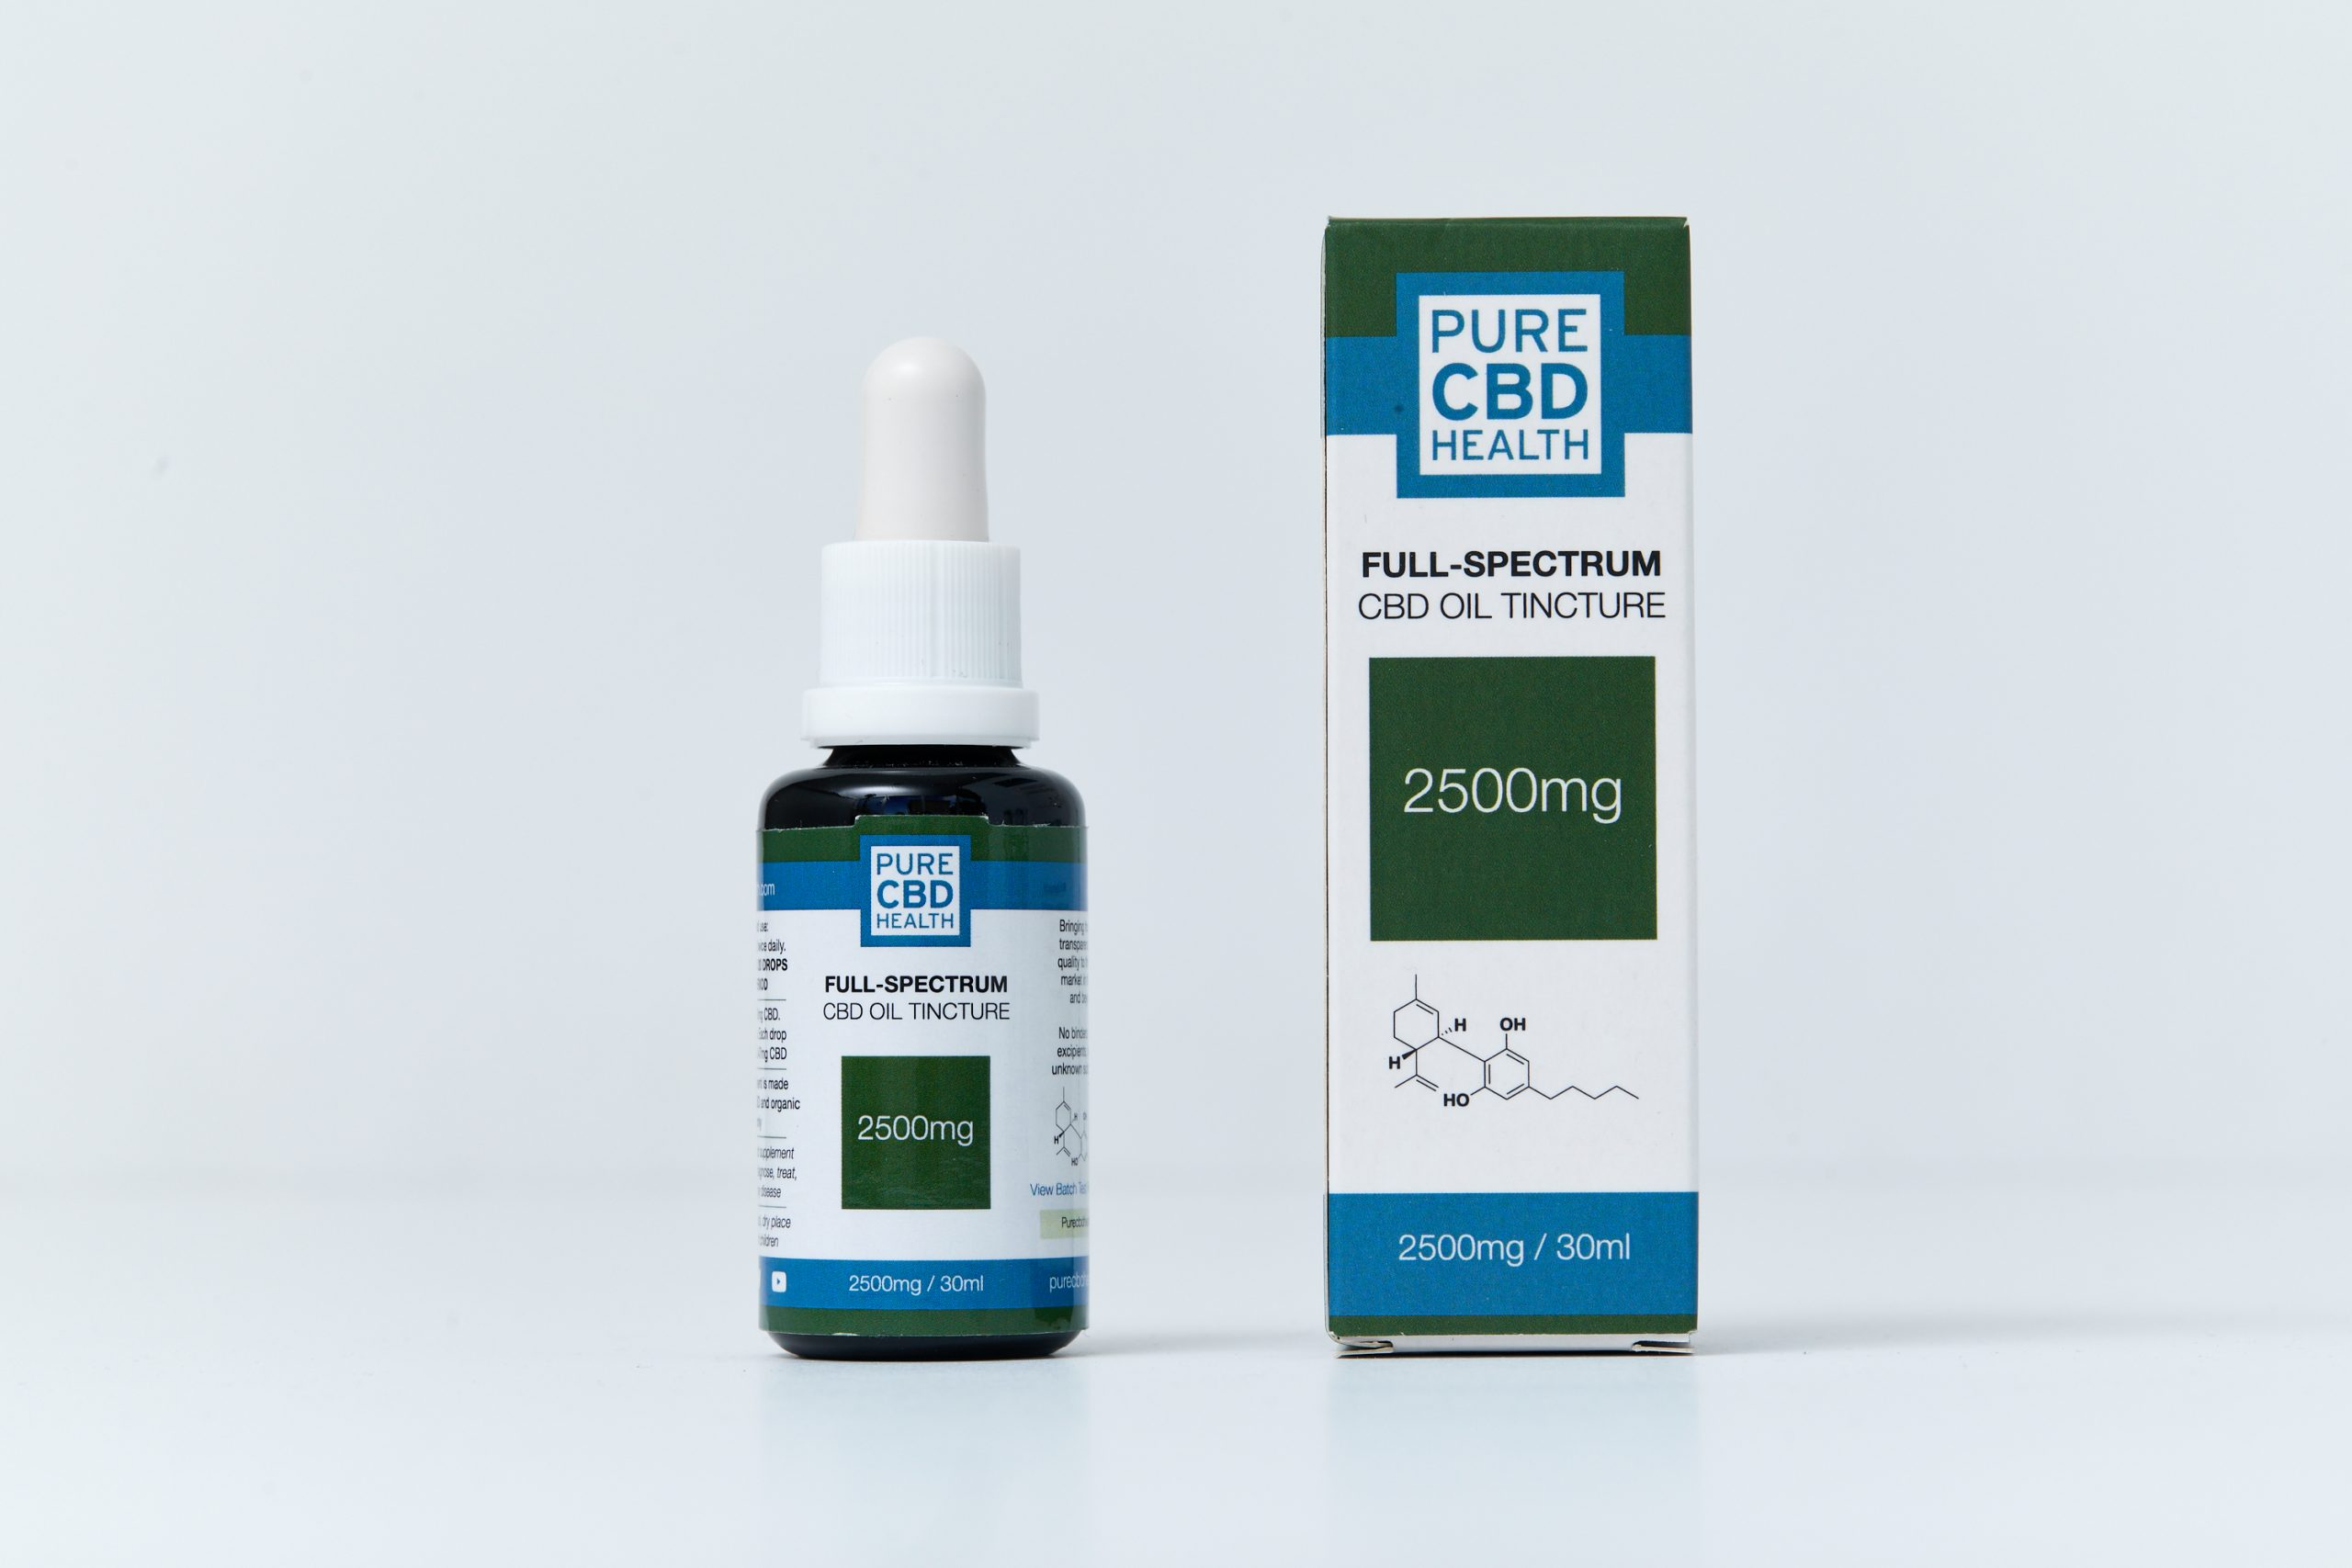 2500mg cbd oil for sale